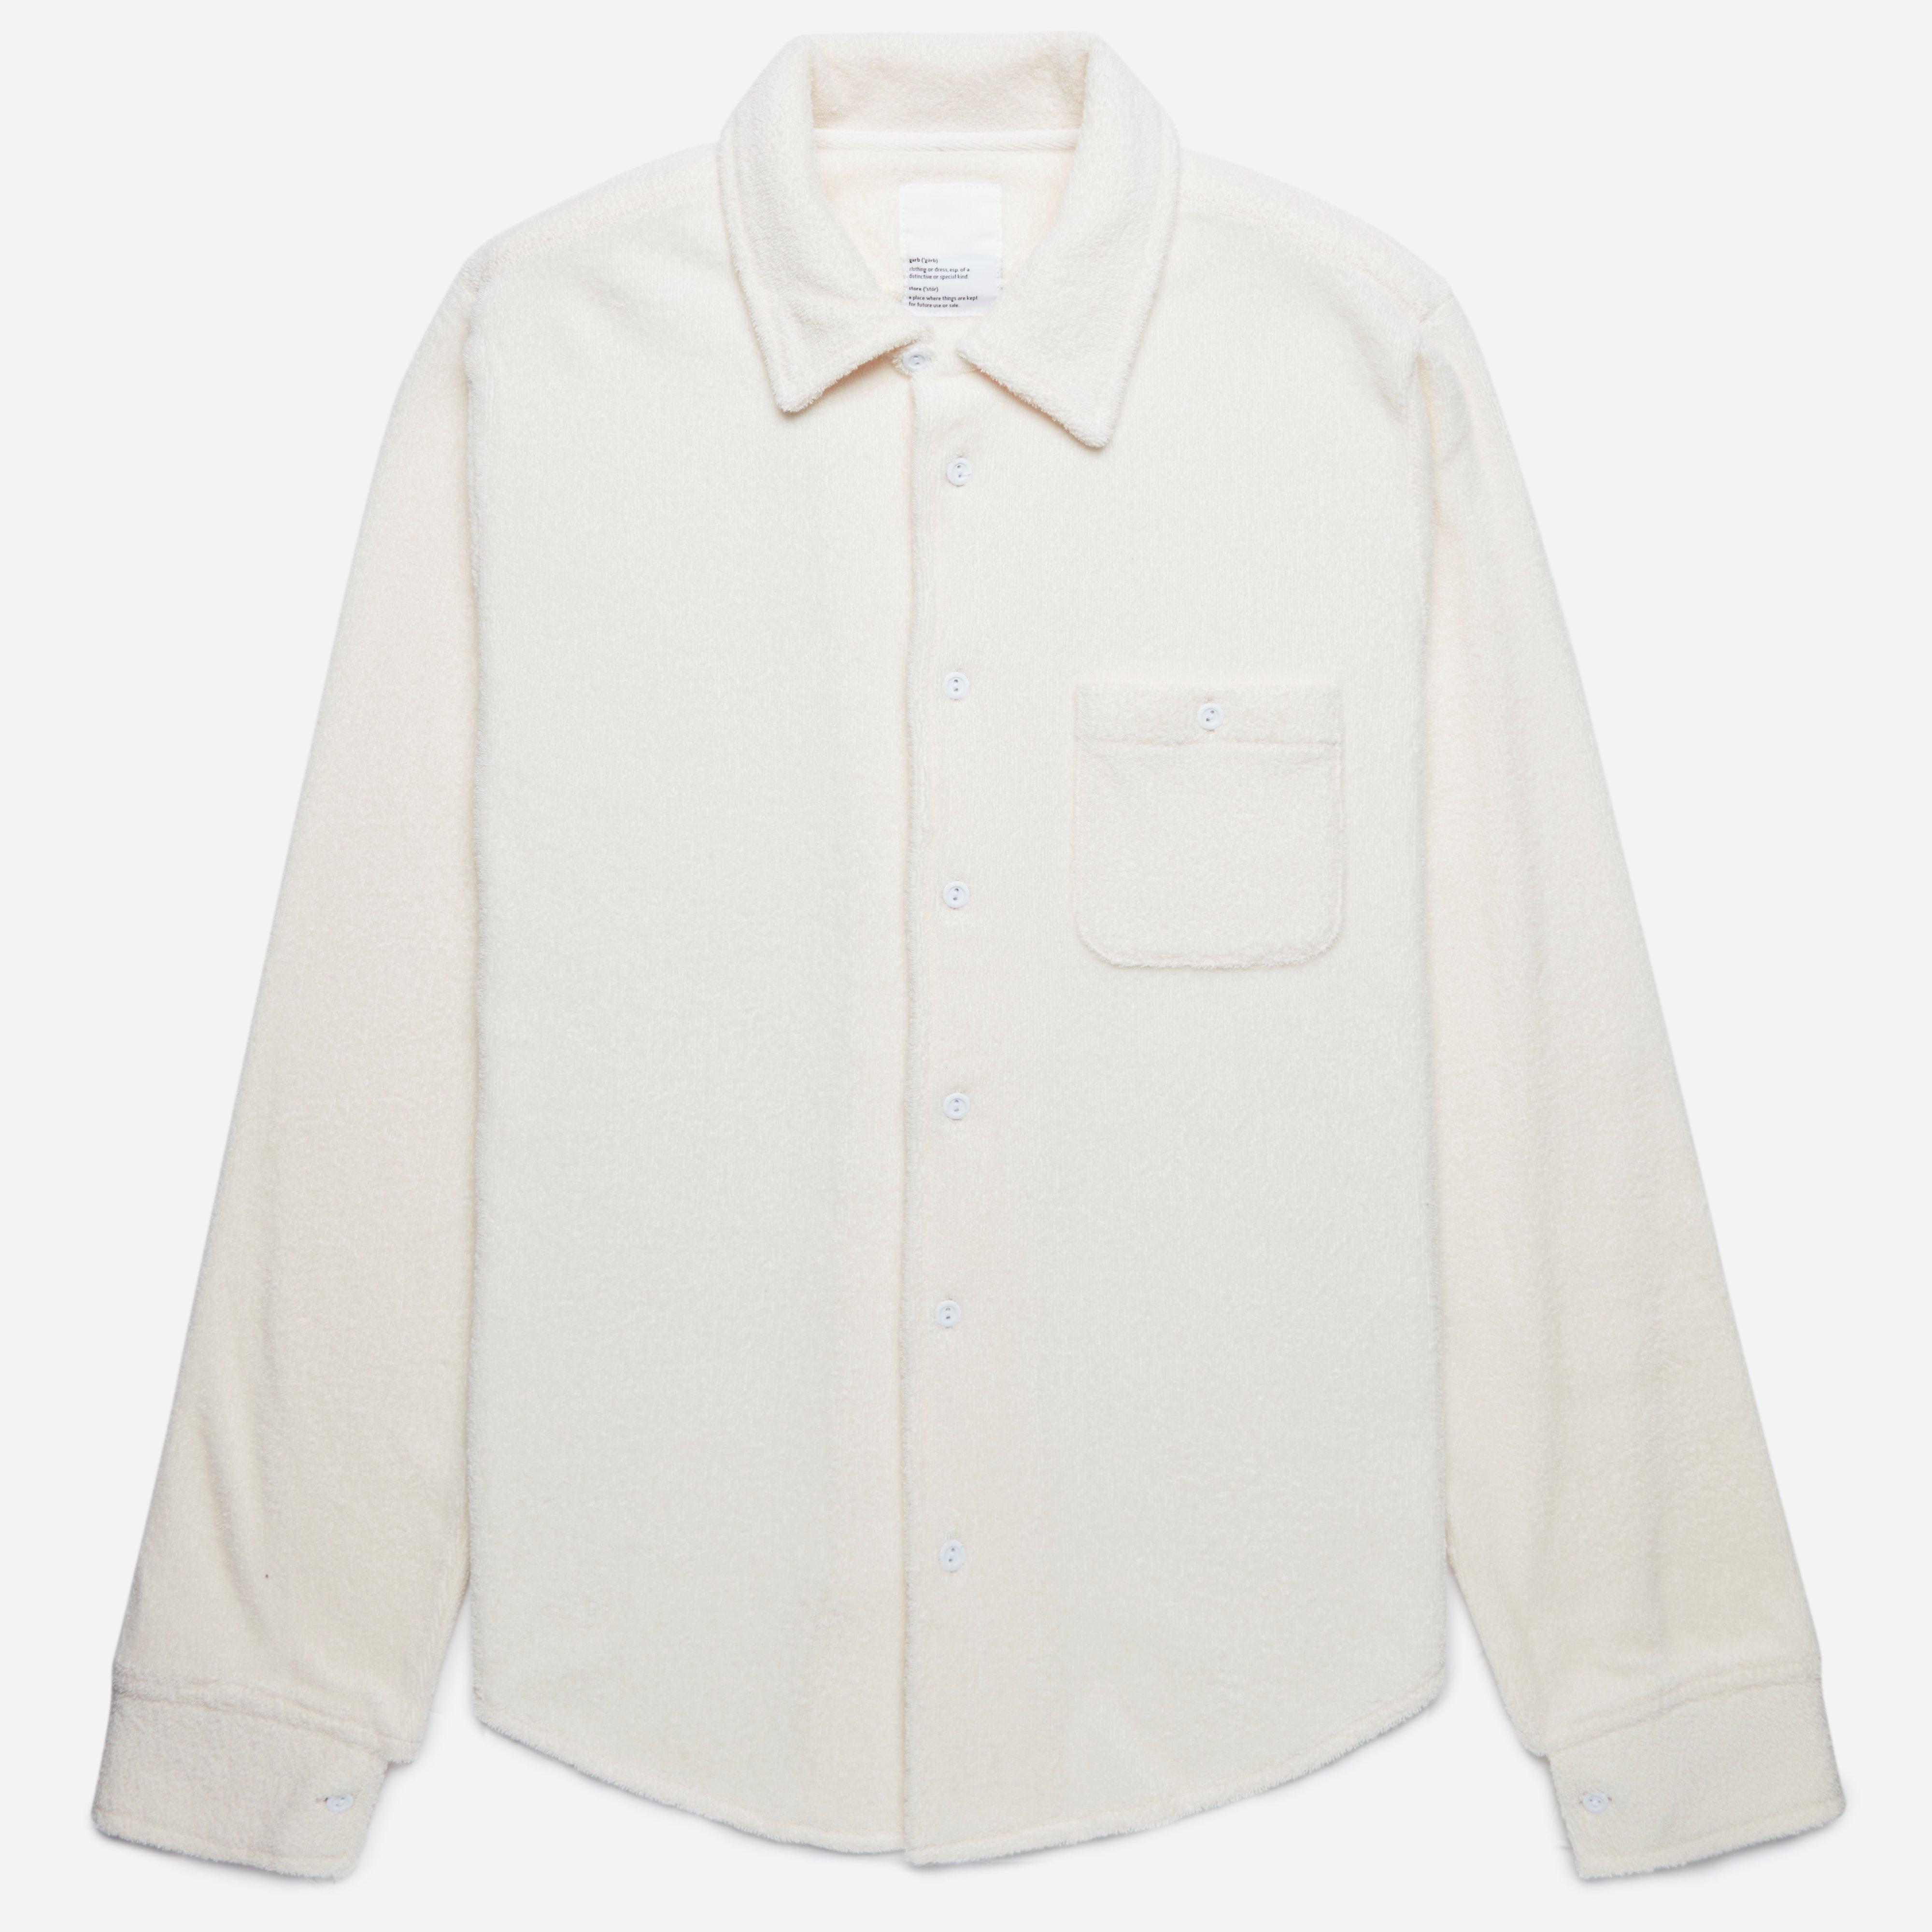 Garbstore Club Shirt